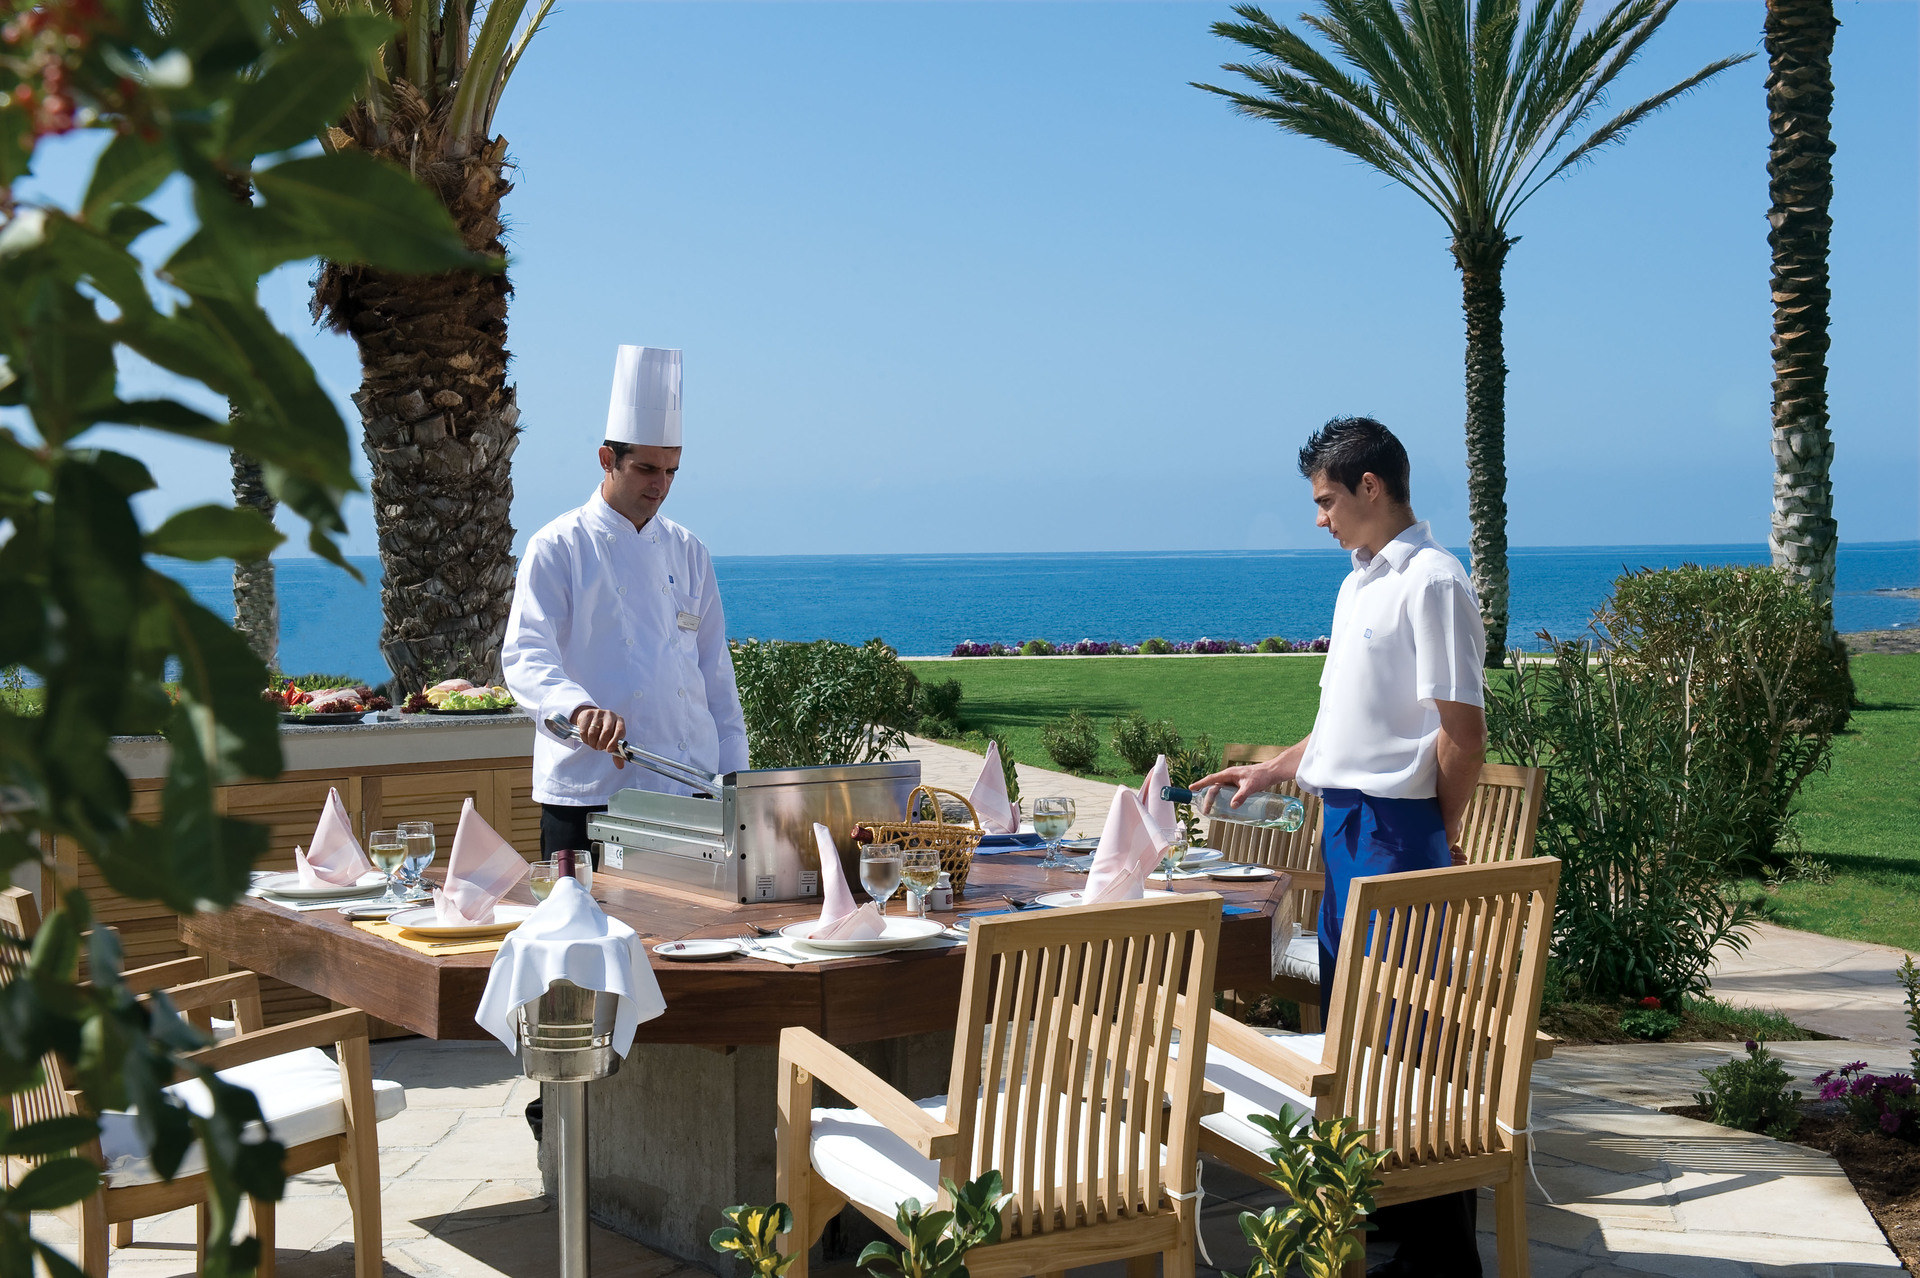 All-inclusive hotel op Cyprus kok